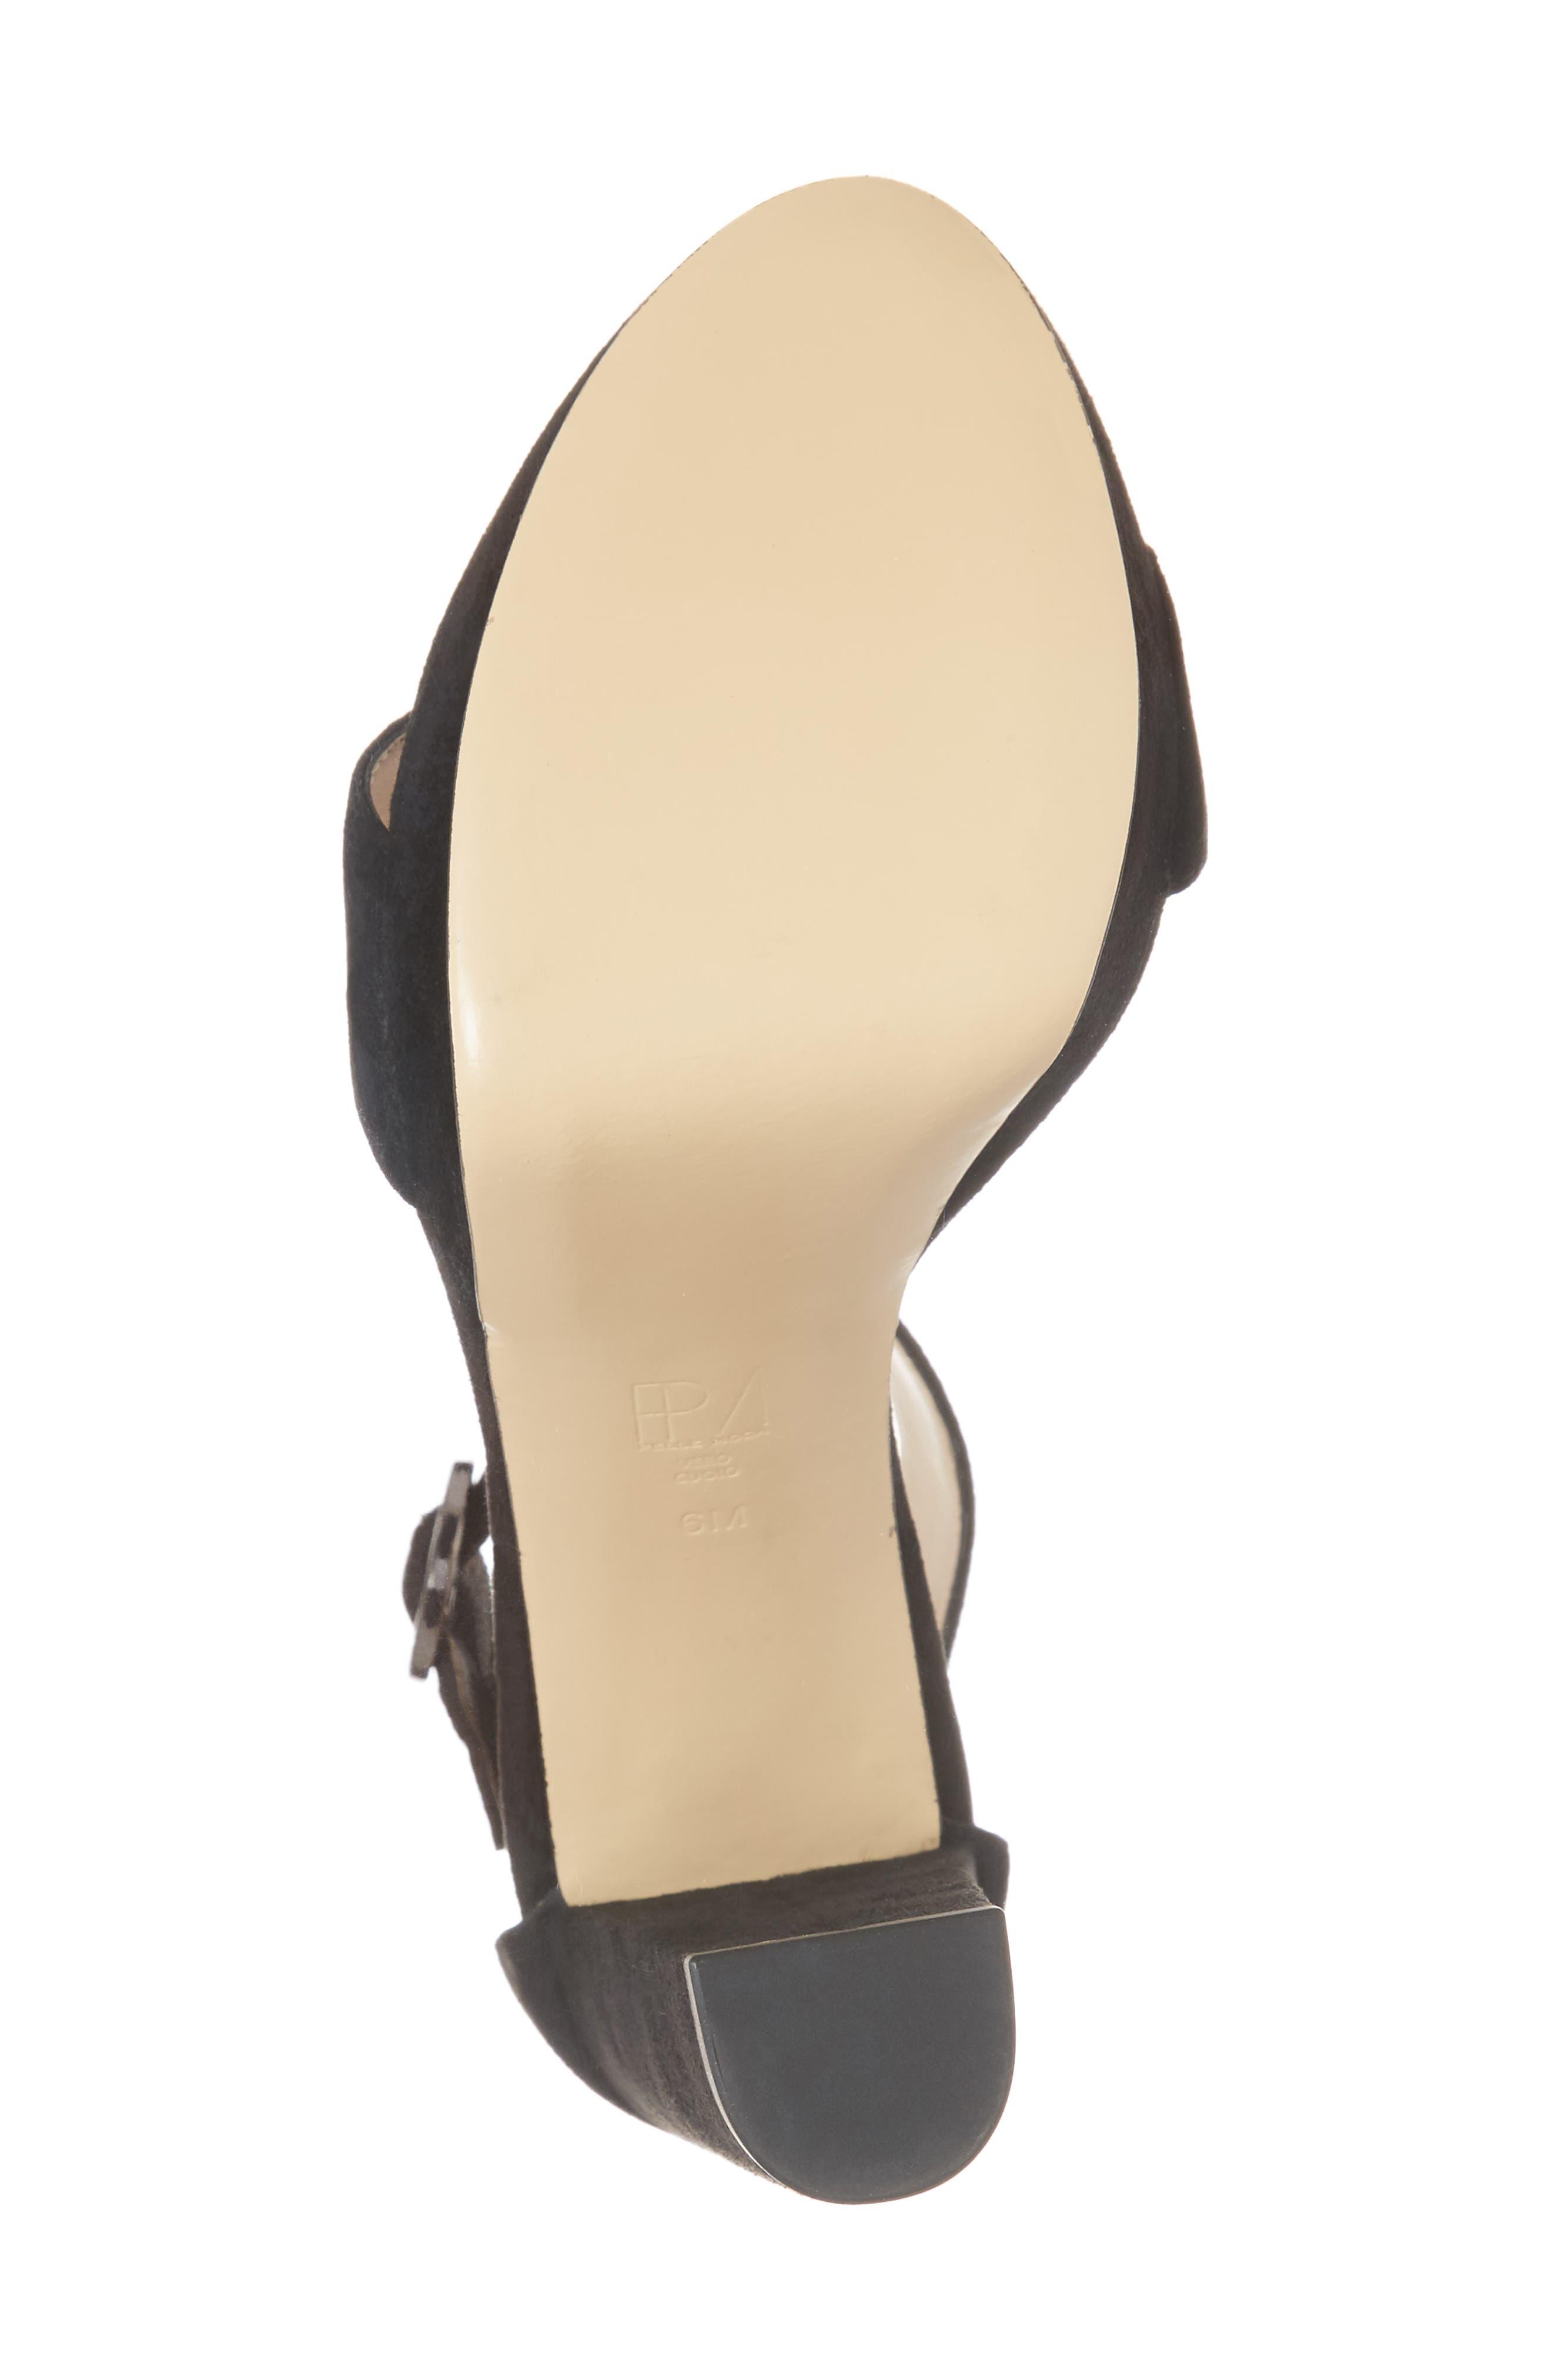 Palo 2 Platform Sandal,                             Alternate thumbnail 6, color,                             Black Suede